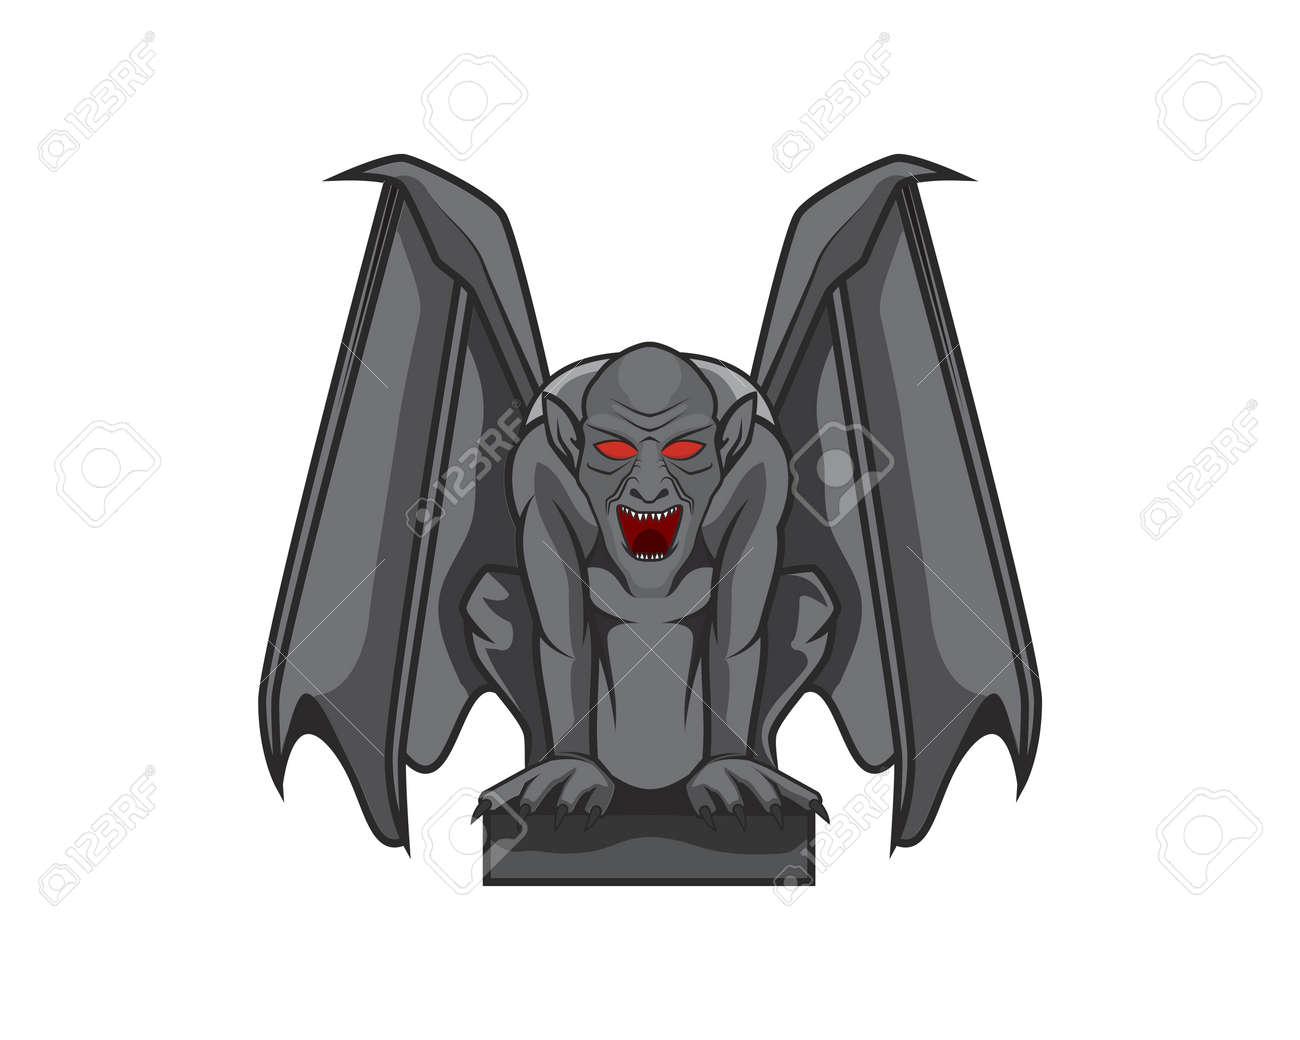 Detailed Gargoyle with Sitting Pose Illustration Vector - 155049258